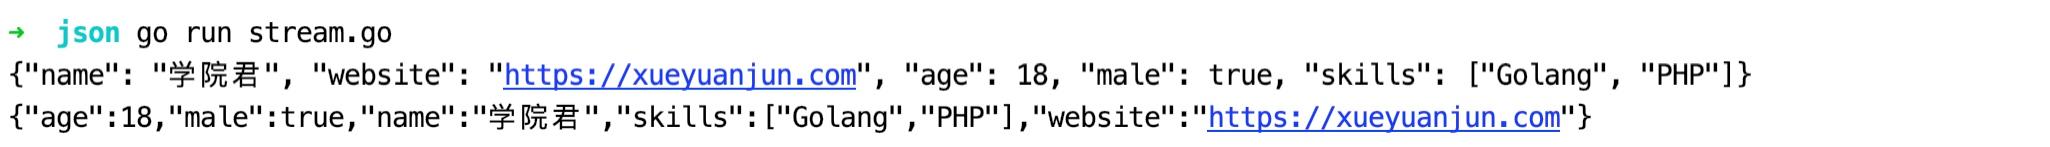 JSON 流式读写演示